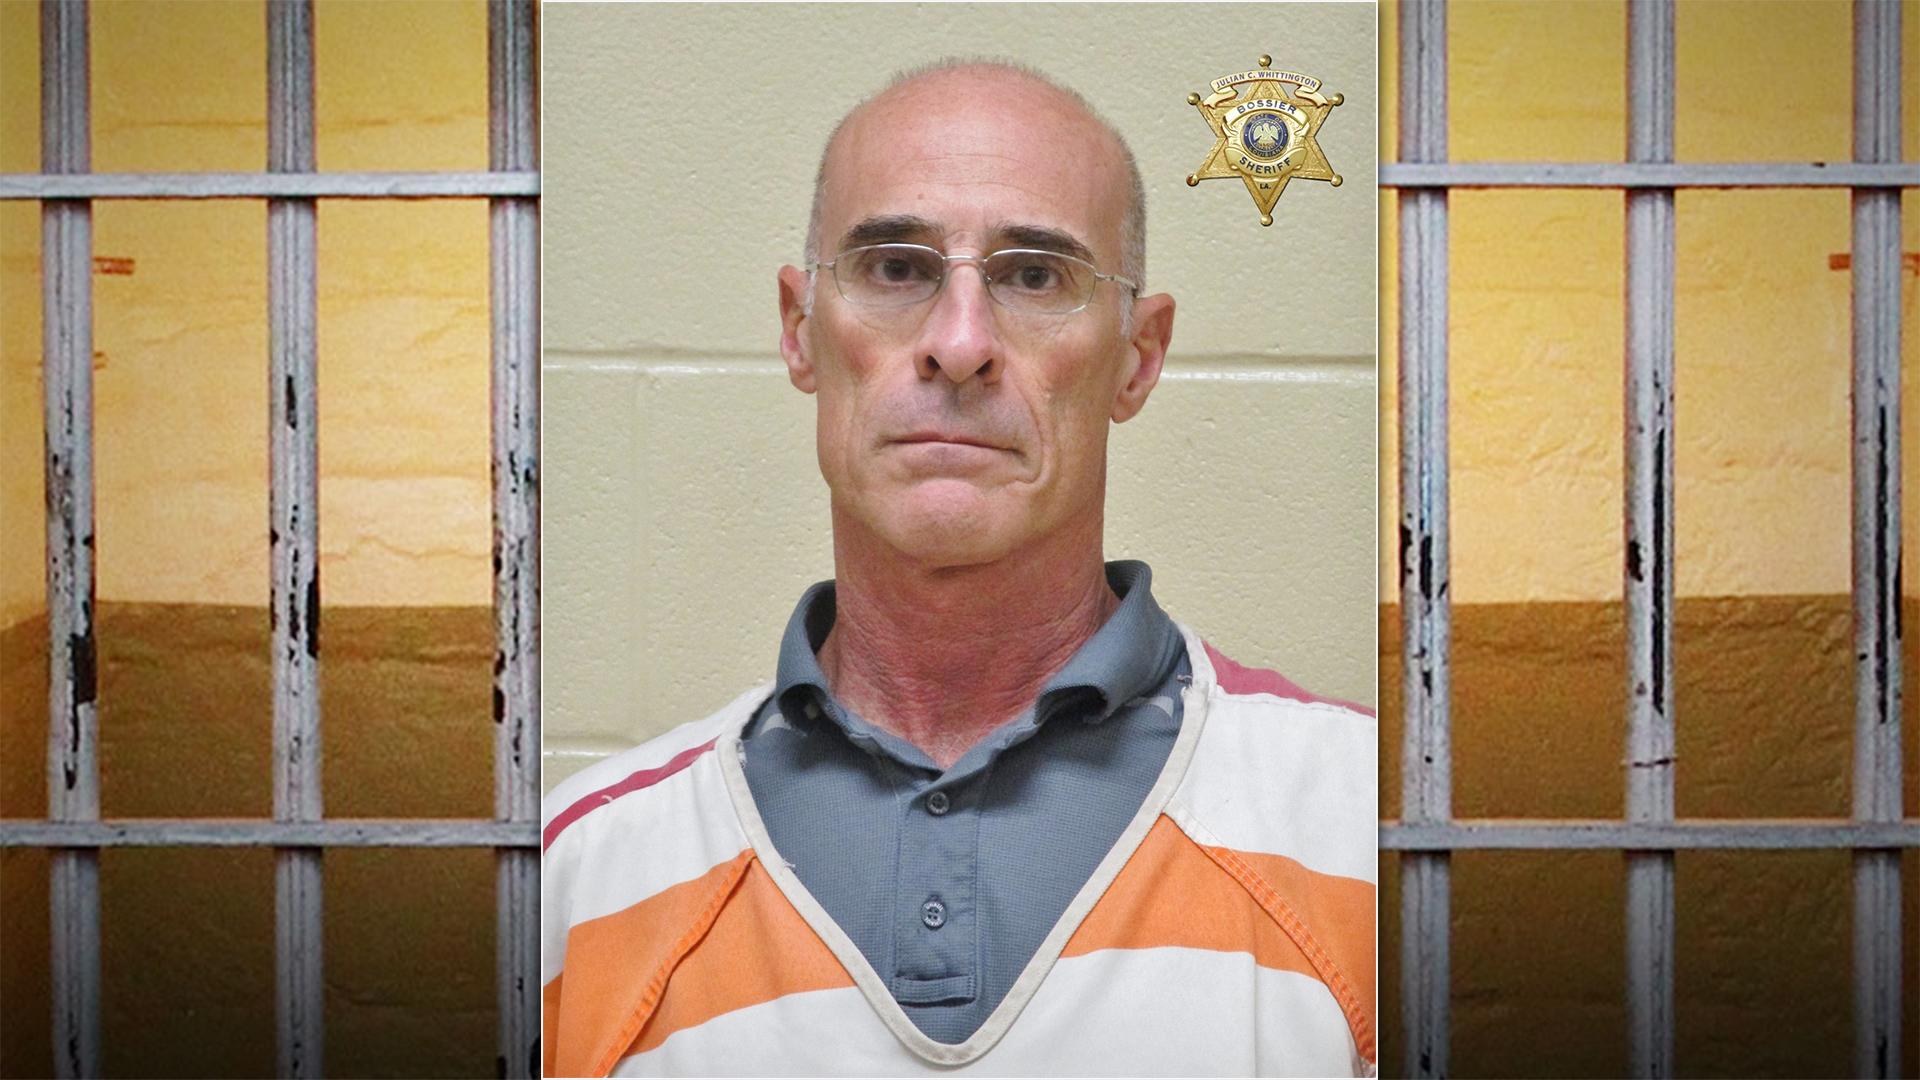 Albuquerque man accused of exposing himself to neighbors